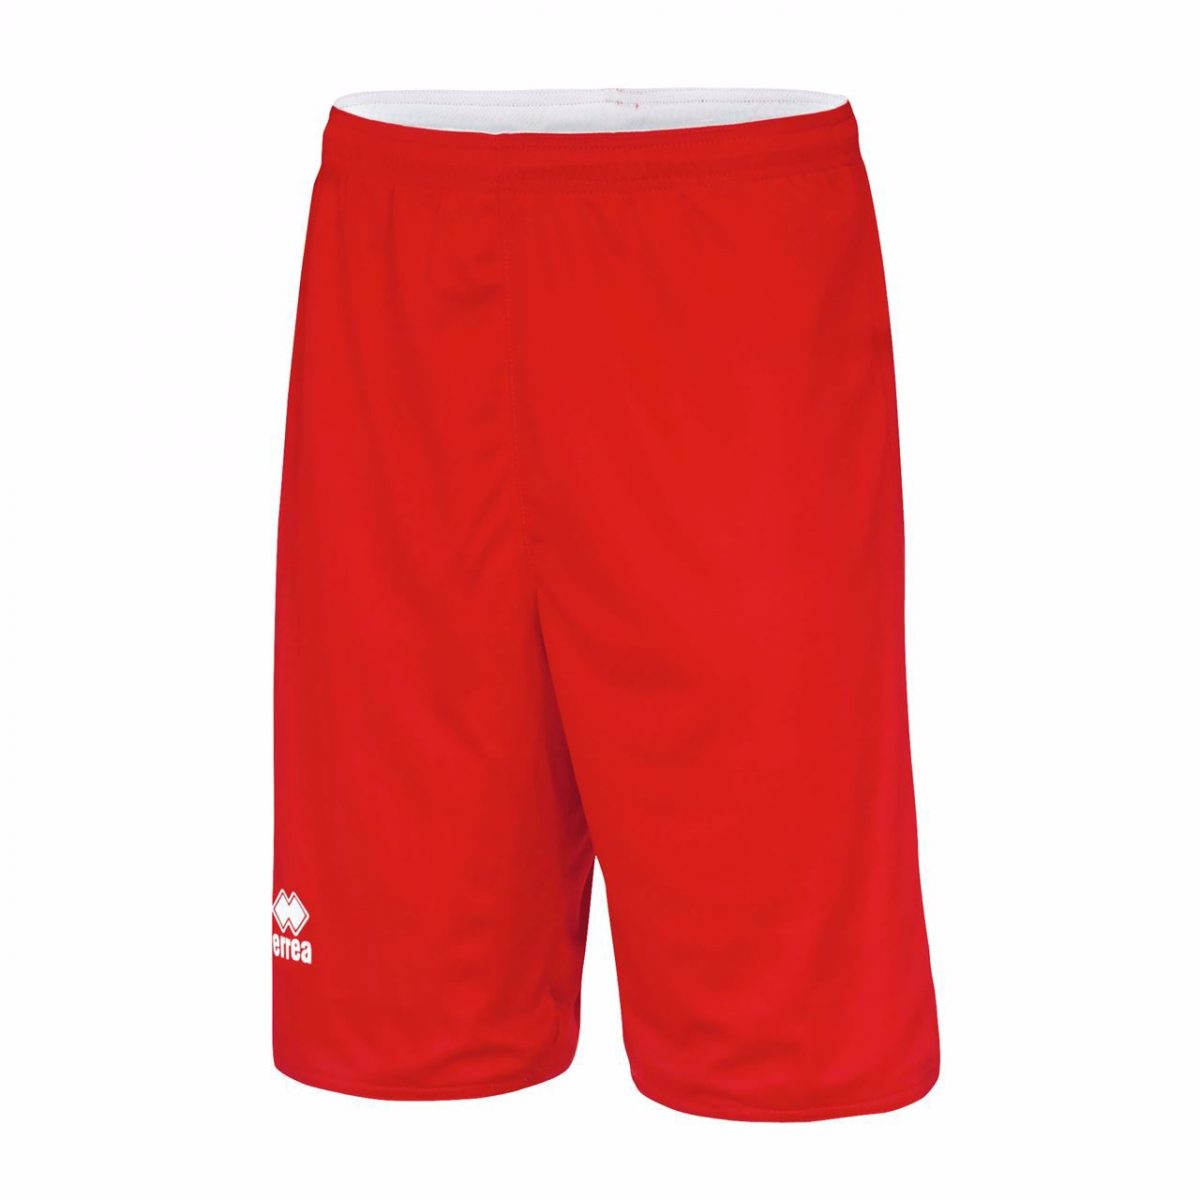 Errea CHICAGO Double Shorts - junior